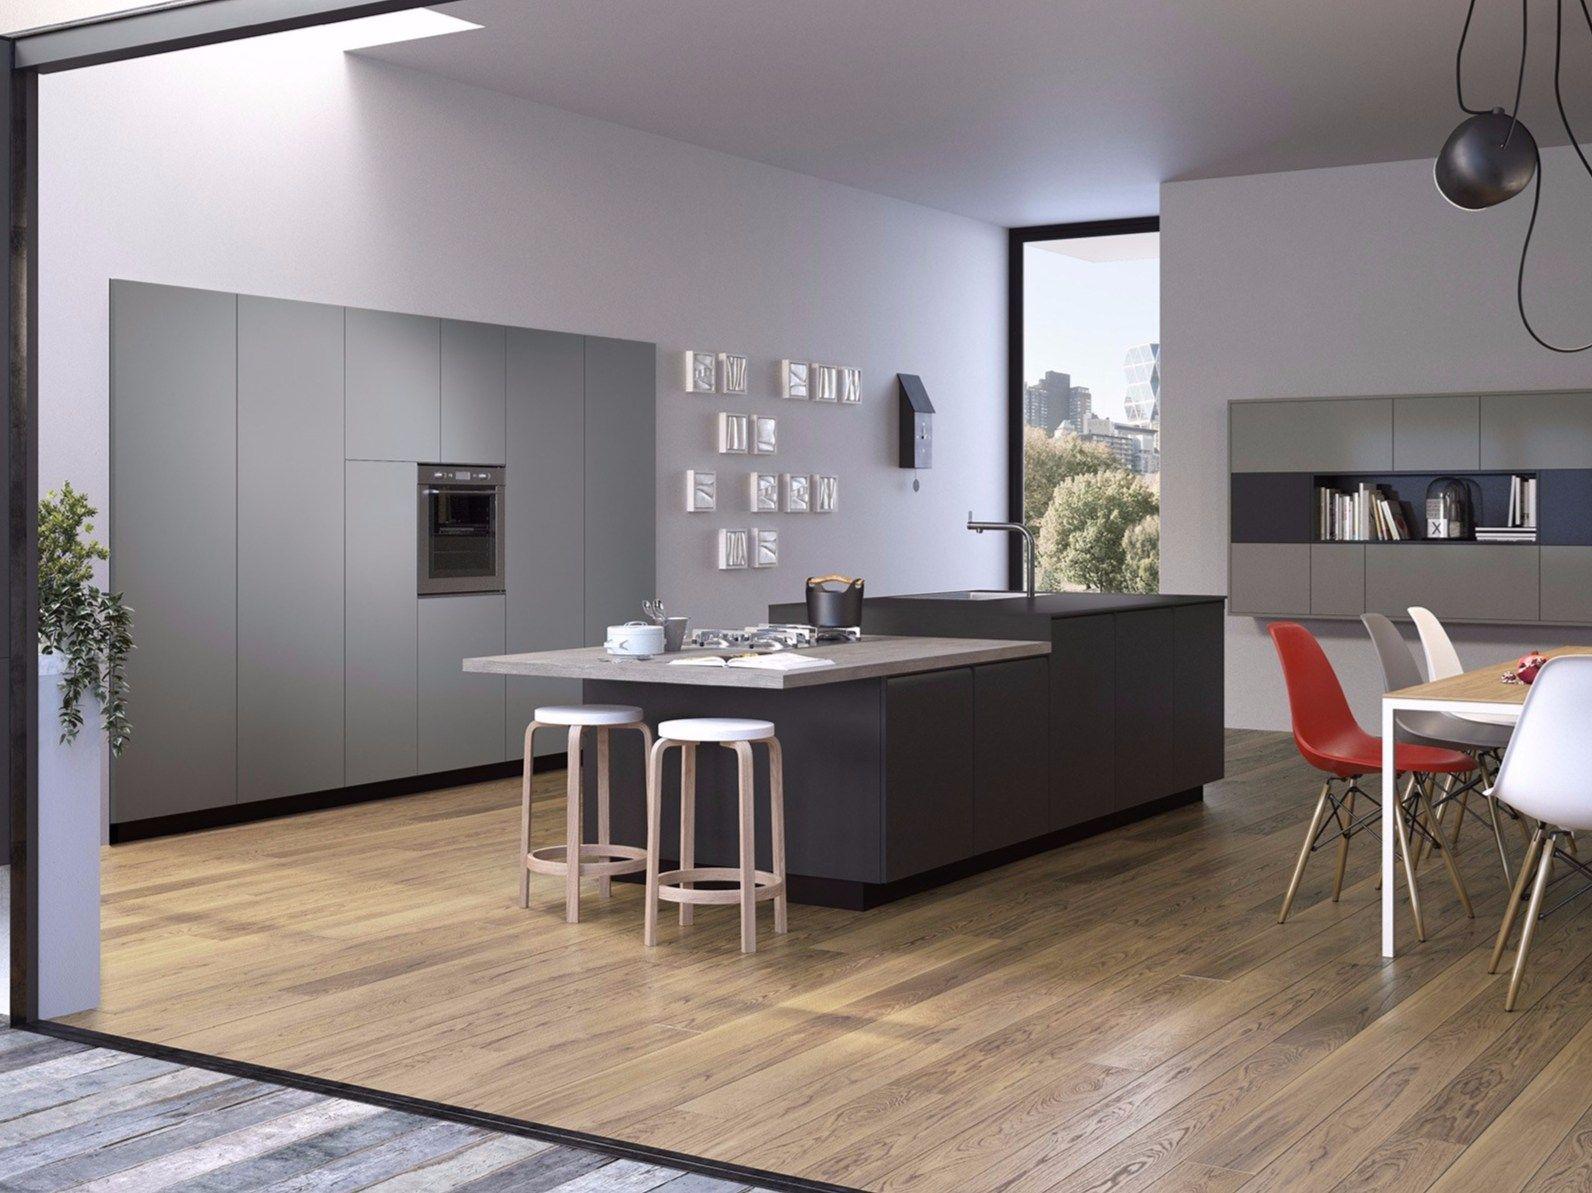 Cucina con maniglie integrate gibilterra by del tongo design egidio panzera r d del tongo - Del tongo cucina ...